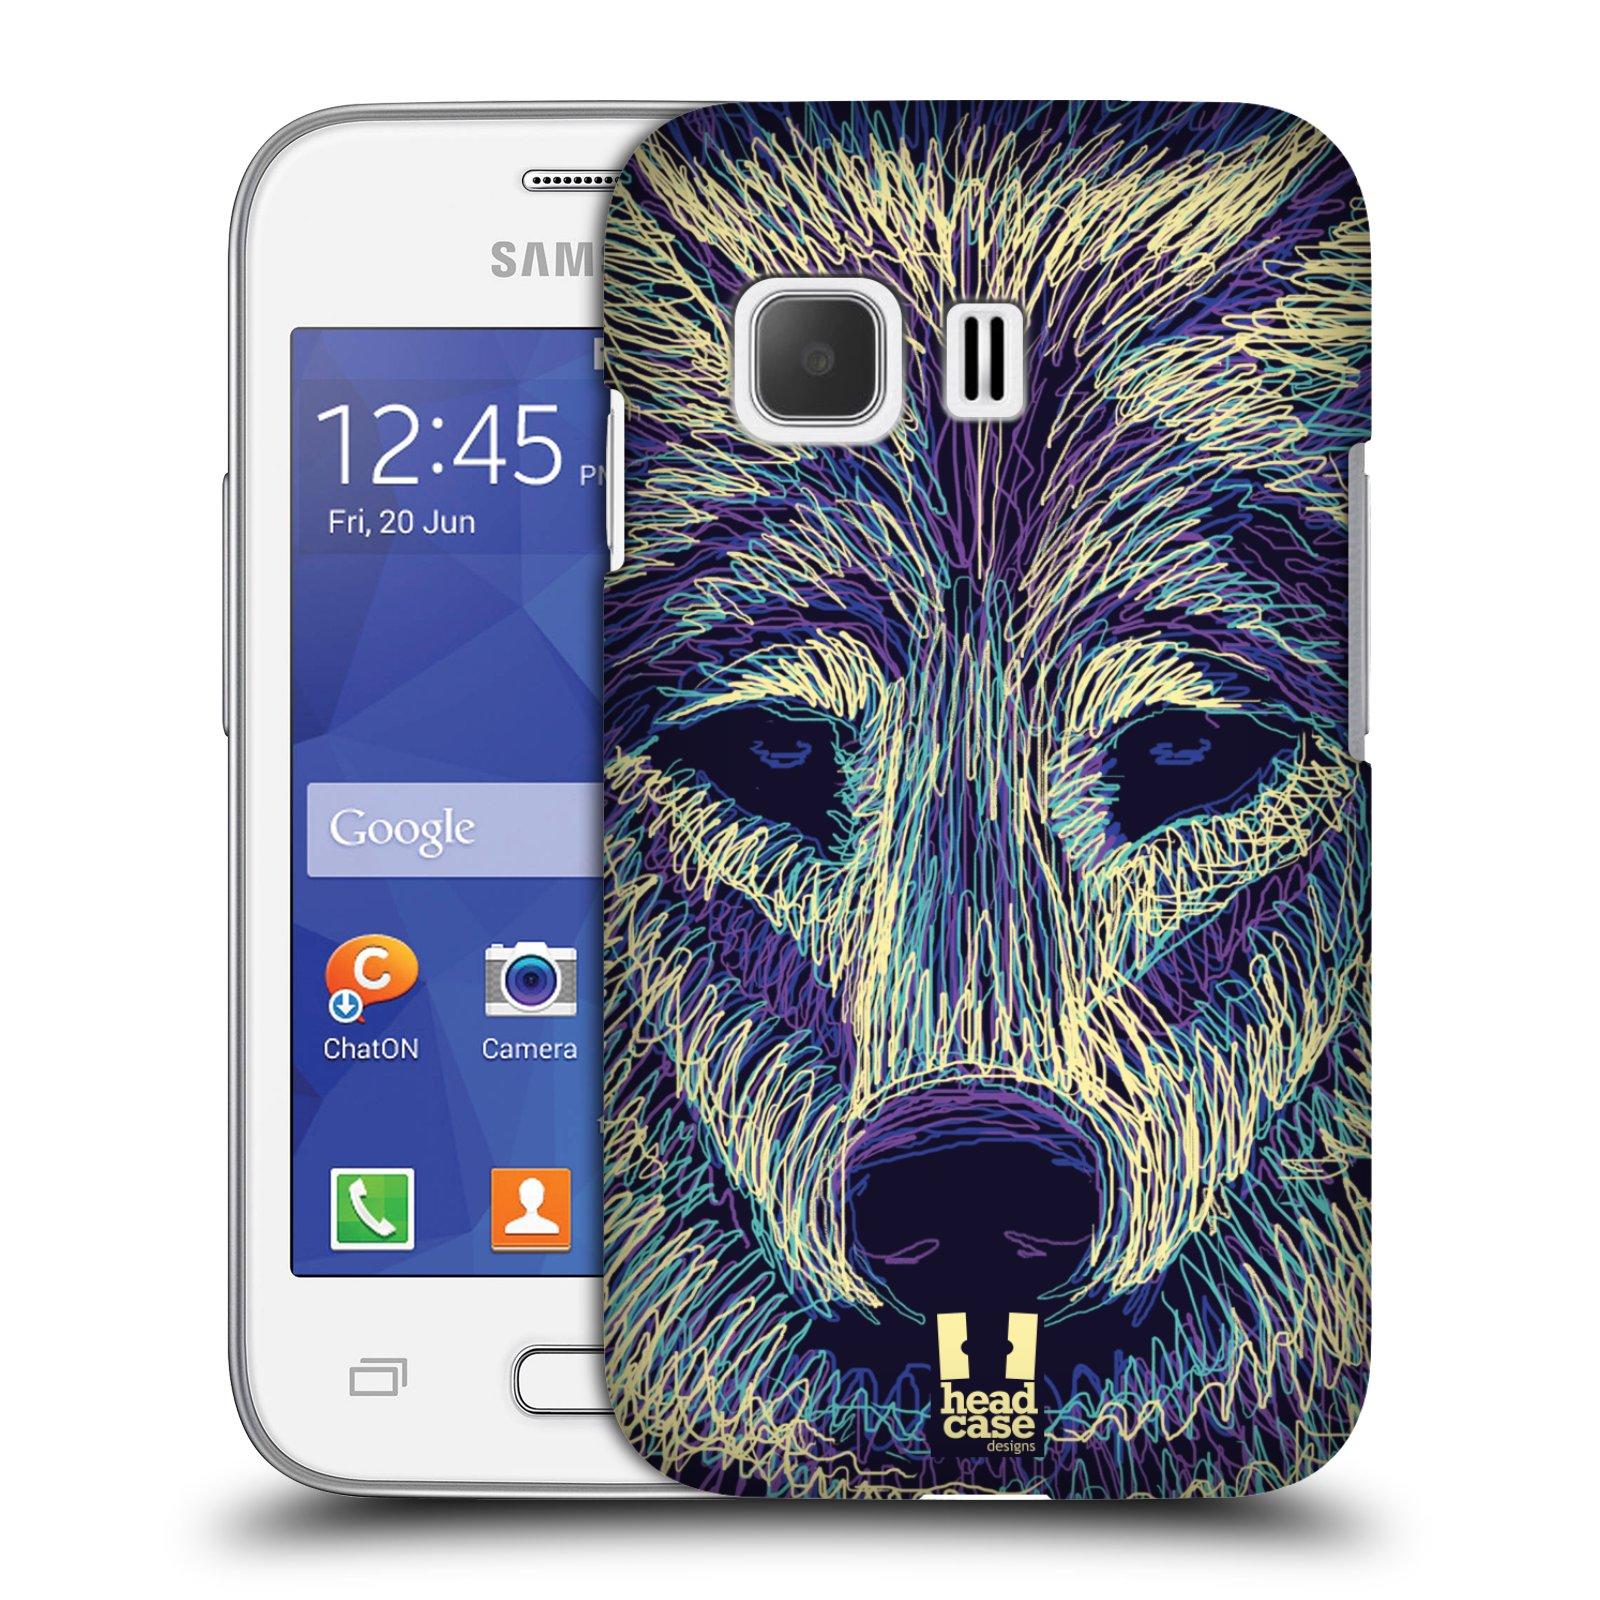 HEAD CASE plastový obal na mobil SAMSUNG Galaxy Young 2 (G130) vzor zvíře čmáranice vlk